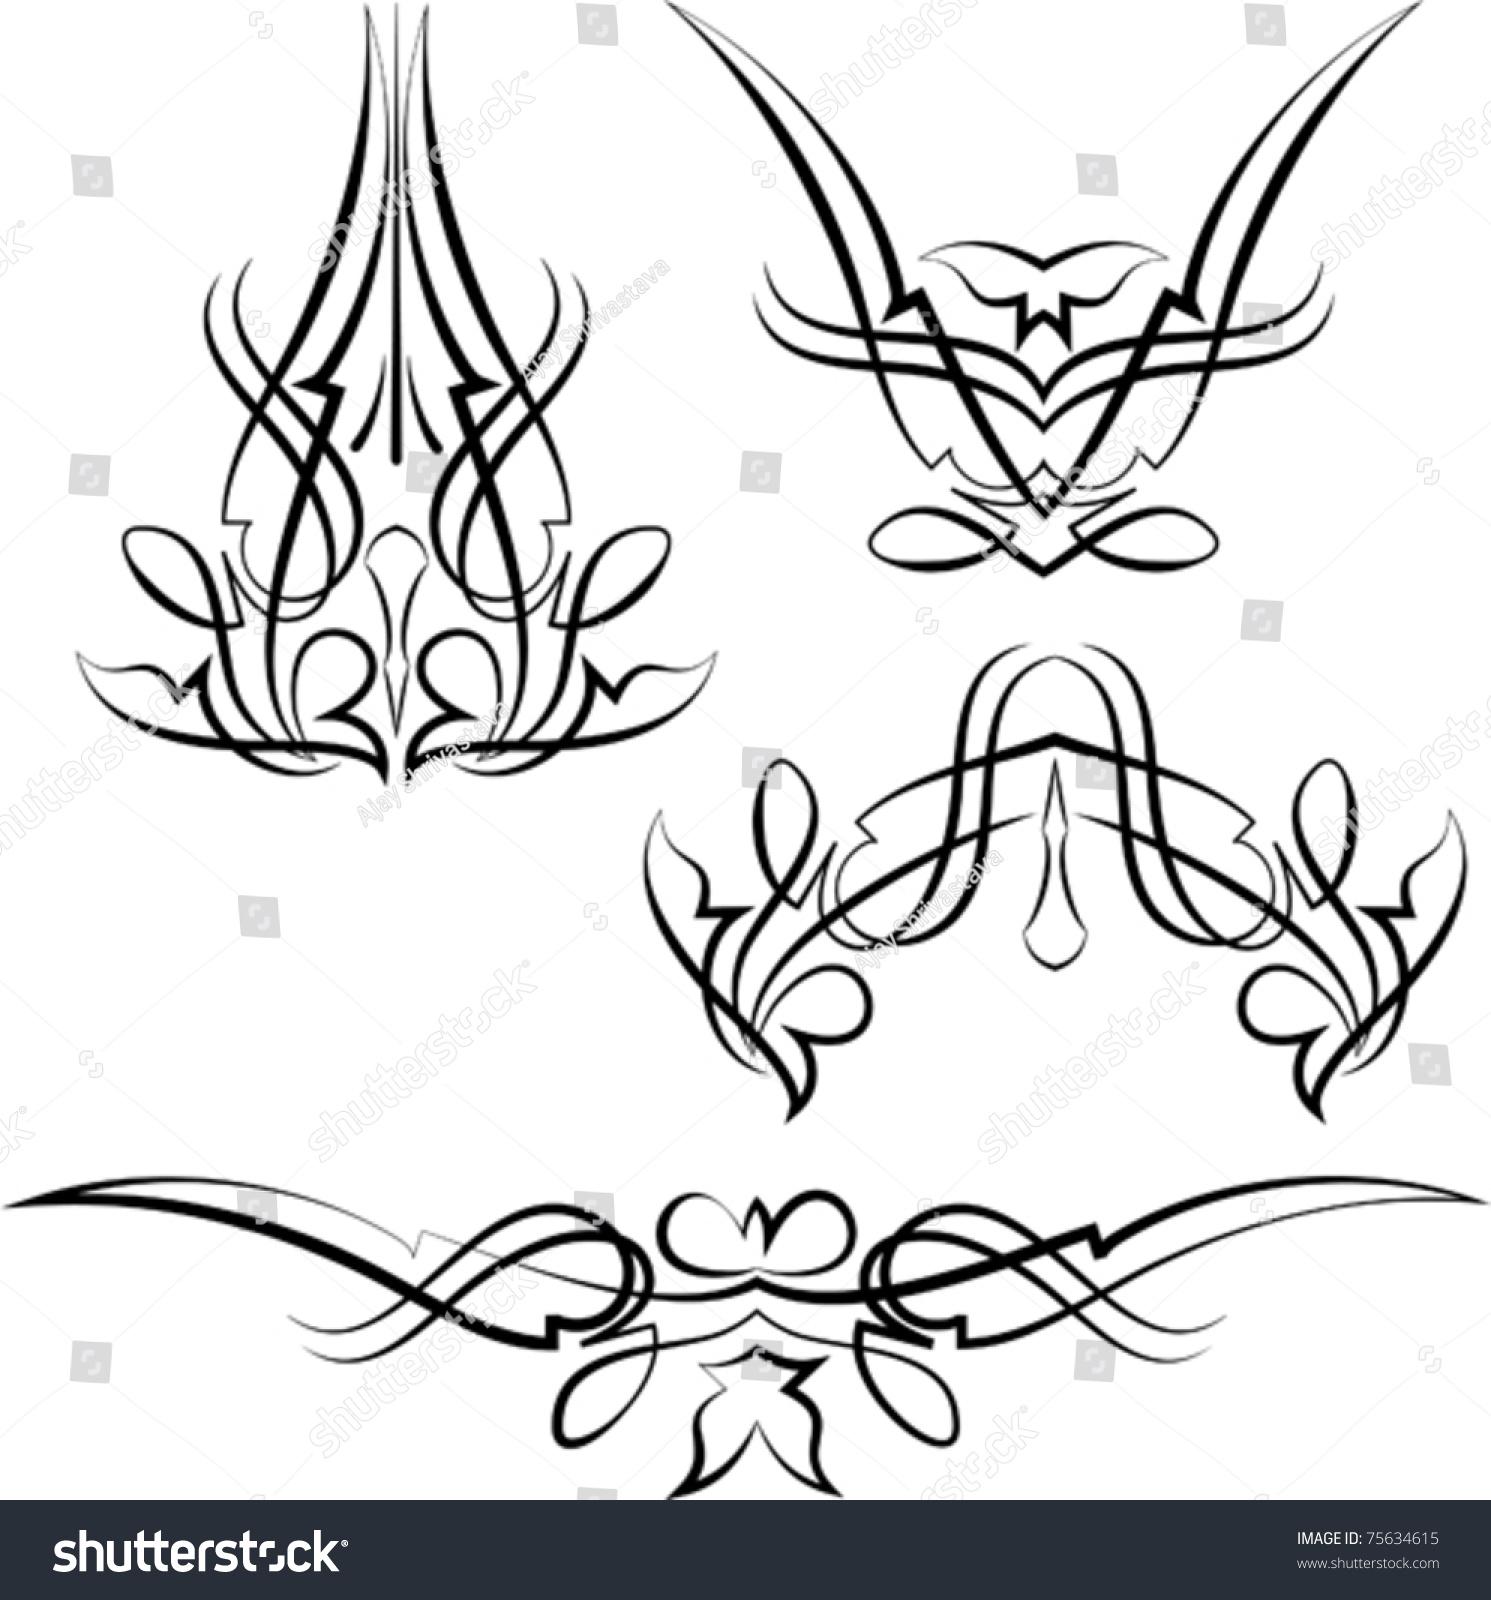 Pinstripe Design Stock Vector 75634615 - Shutterstock